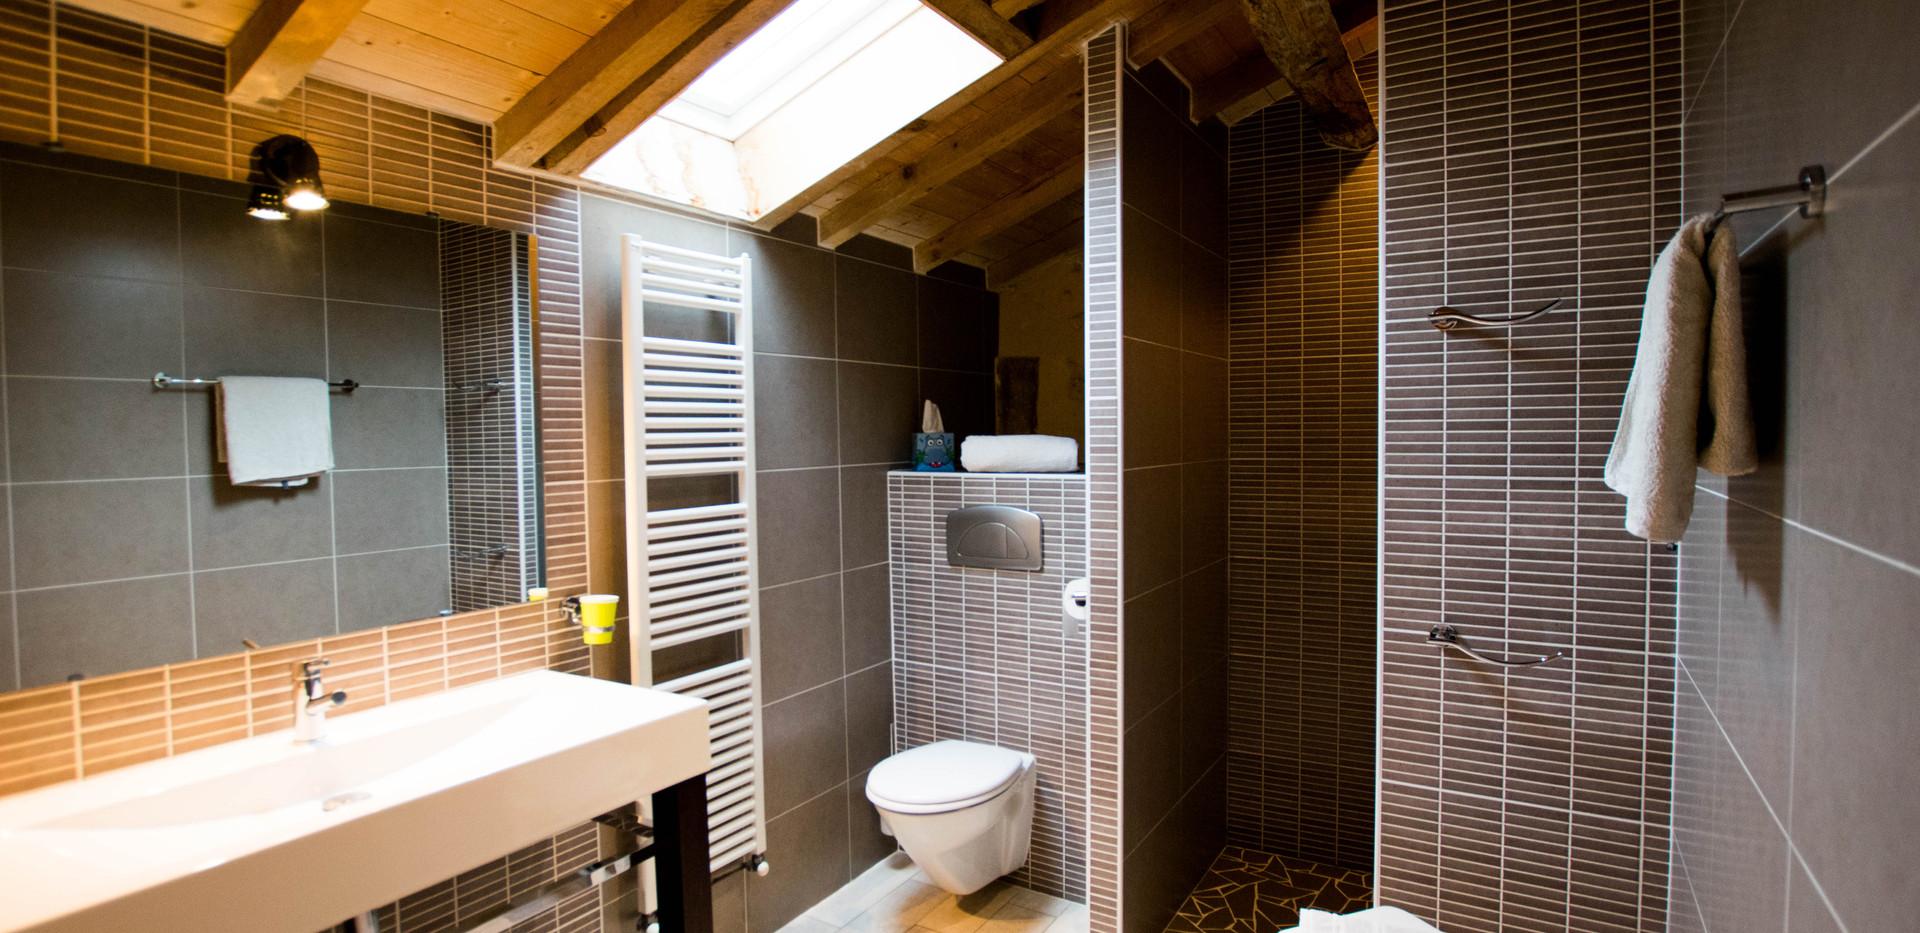 Salle de bain Adrien avec douche